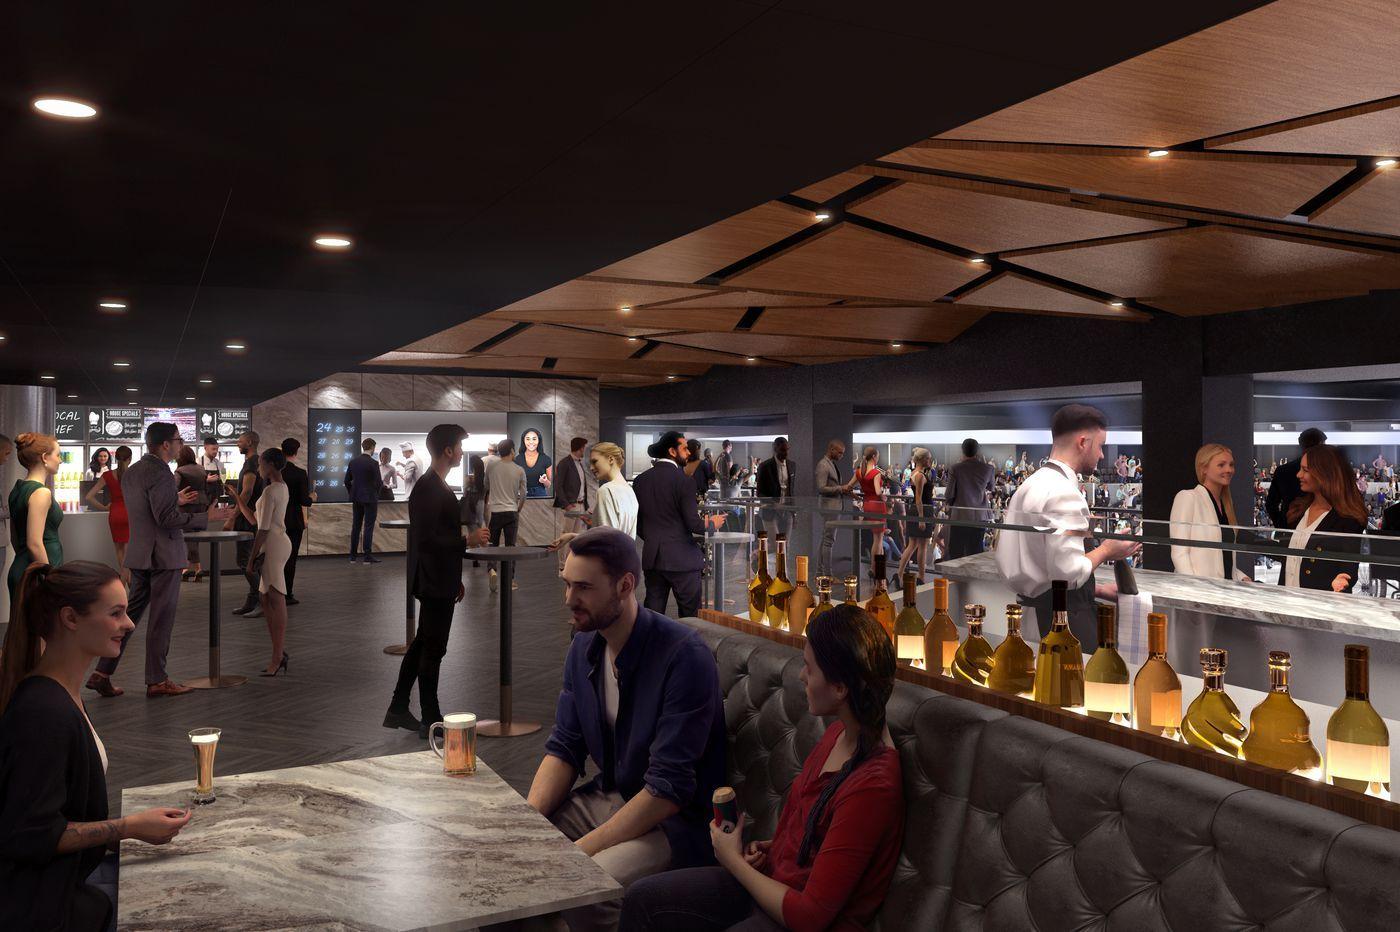 Wells Fargo Center's fancy new club level will relocate